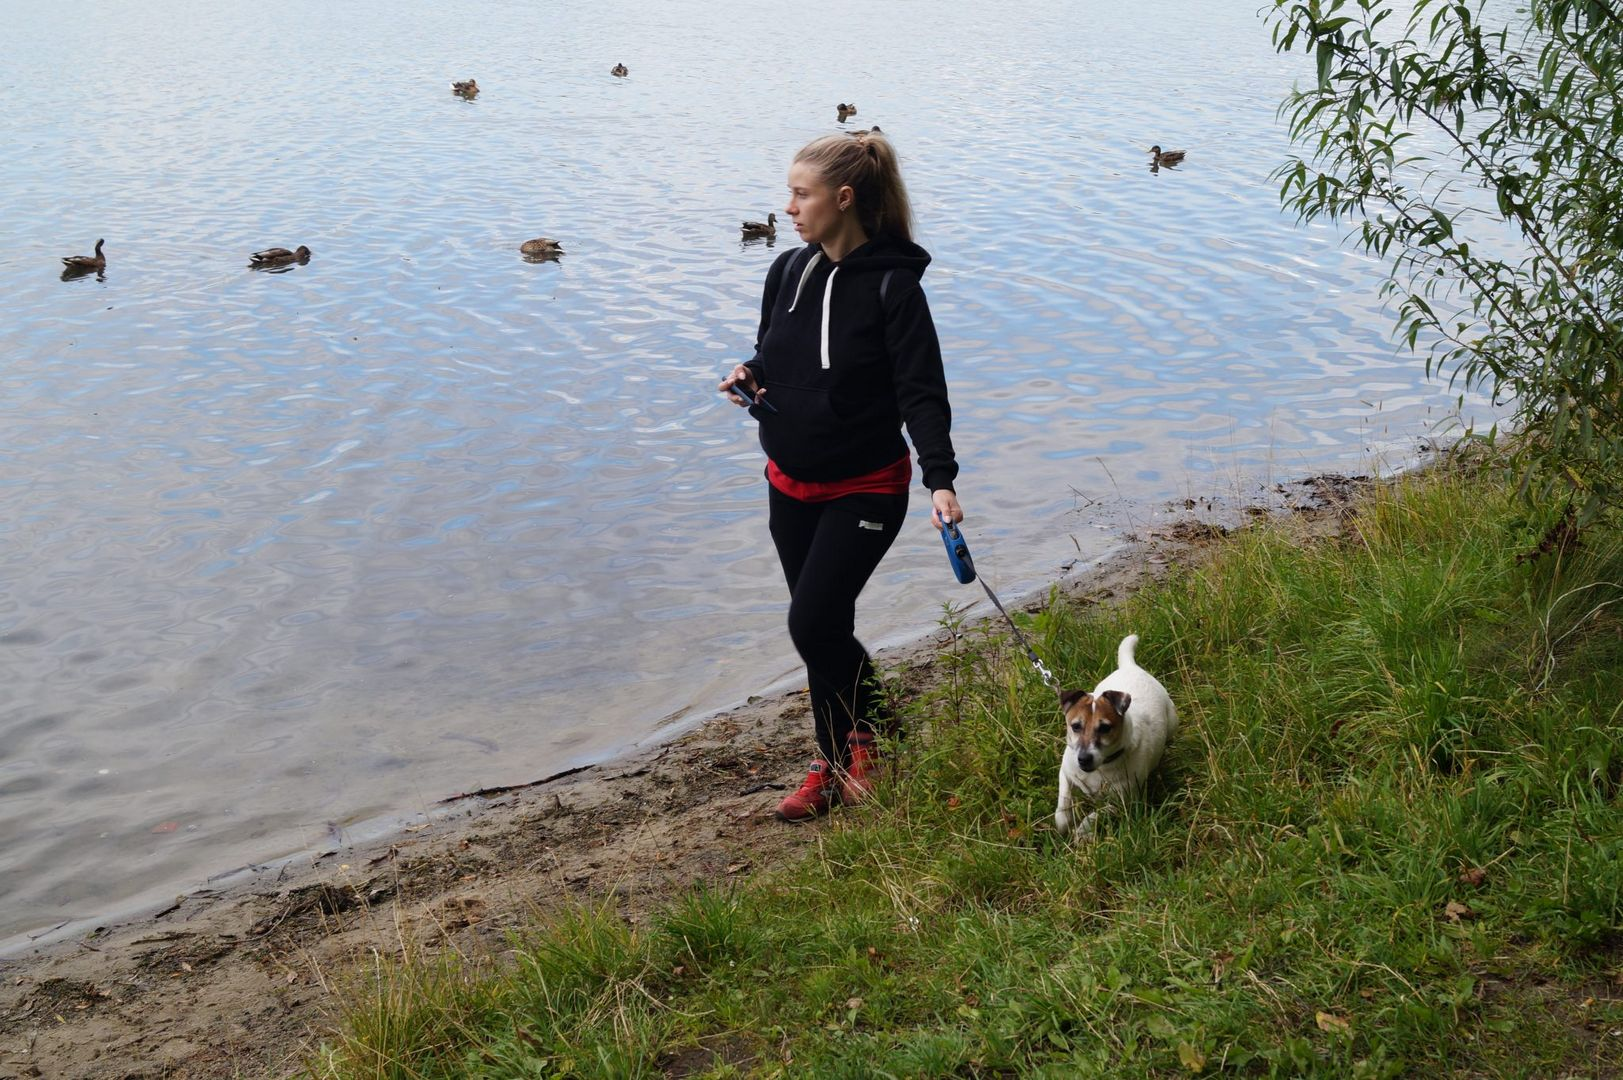 Прогулка с собакой, парк Косино, пруд, собака